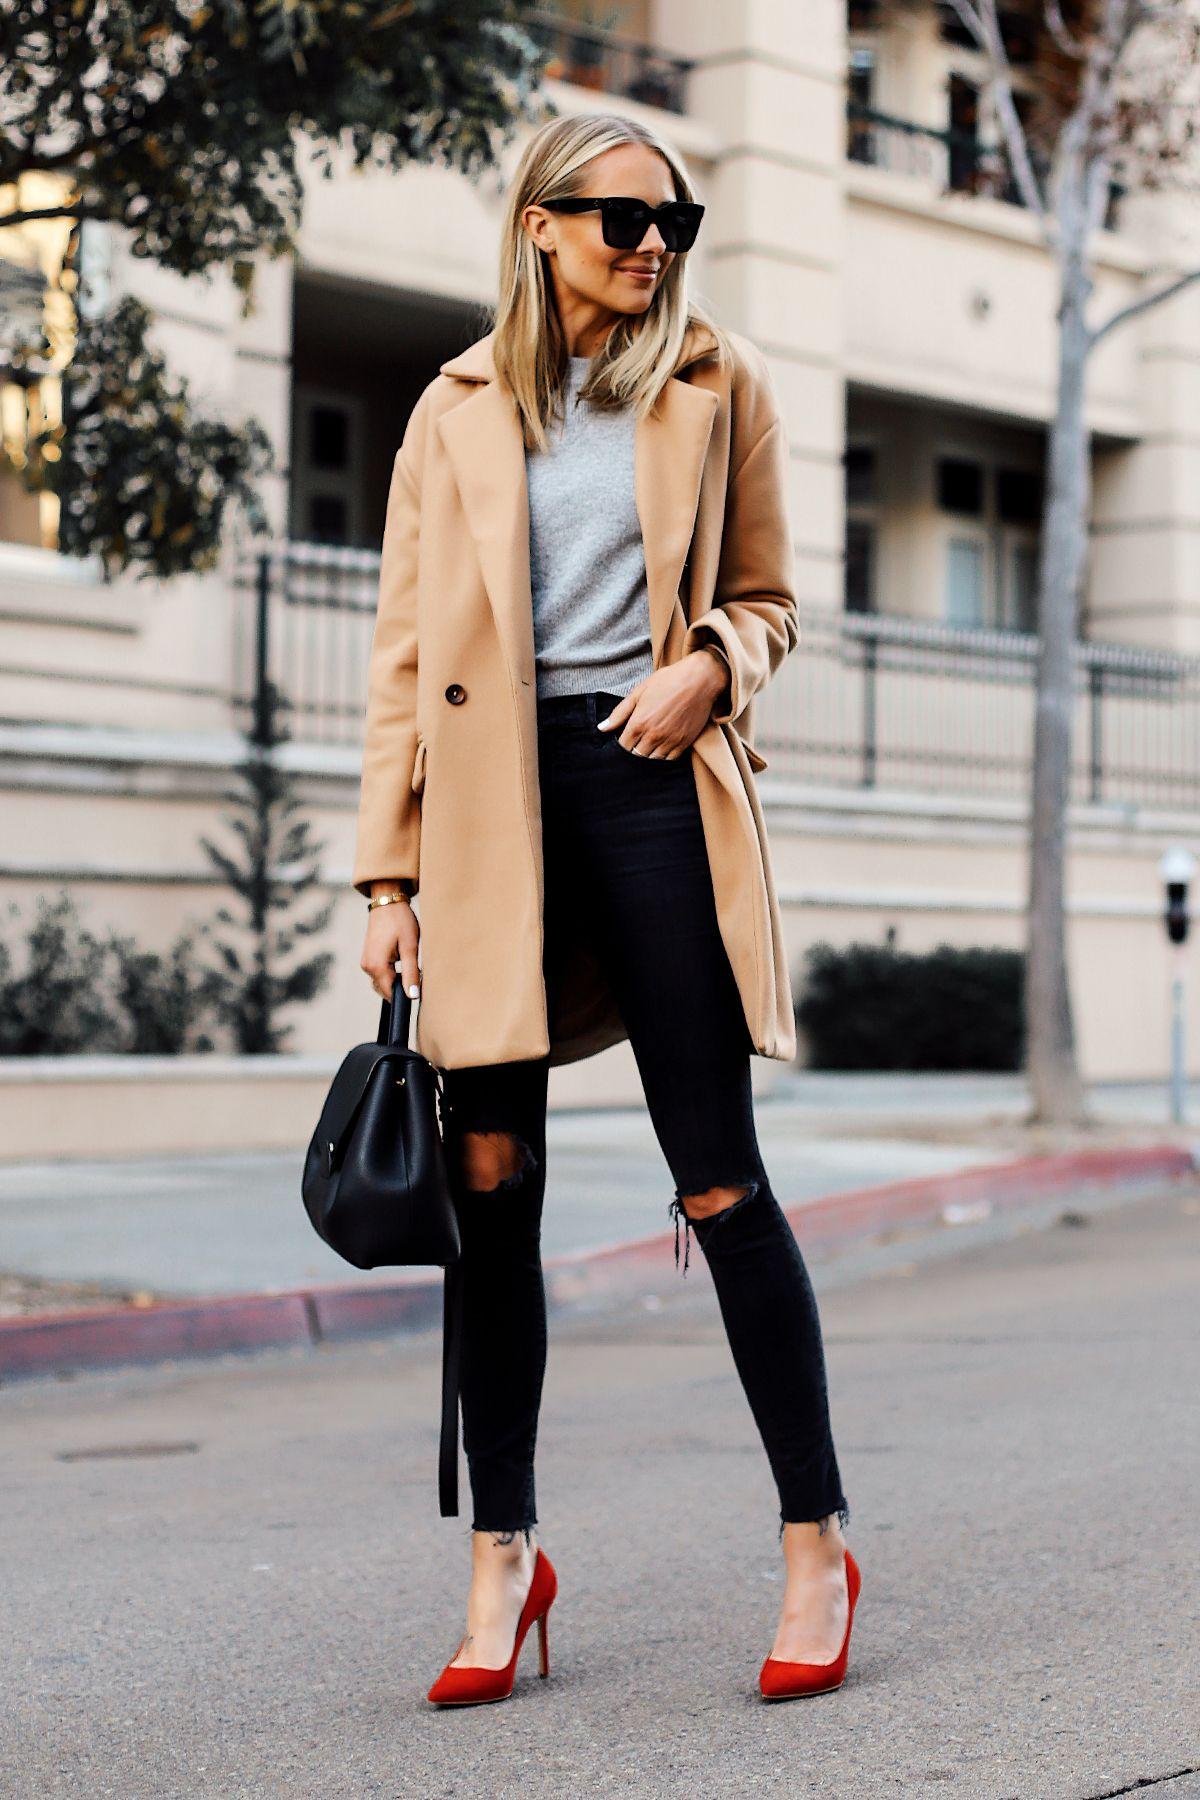 0a98c985ecf Blonde Woman Wearing Camel Coat Grey Sweater Black Ripped Skinny Jeans Red  Pumps Outfit Black Satchel Handbag Fashion Jackson San Diego Fashion  Blogger ...